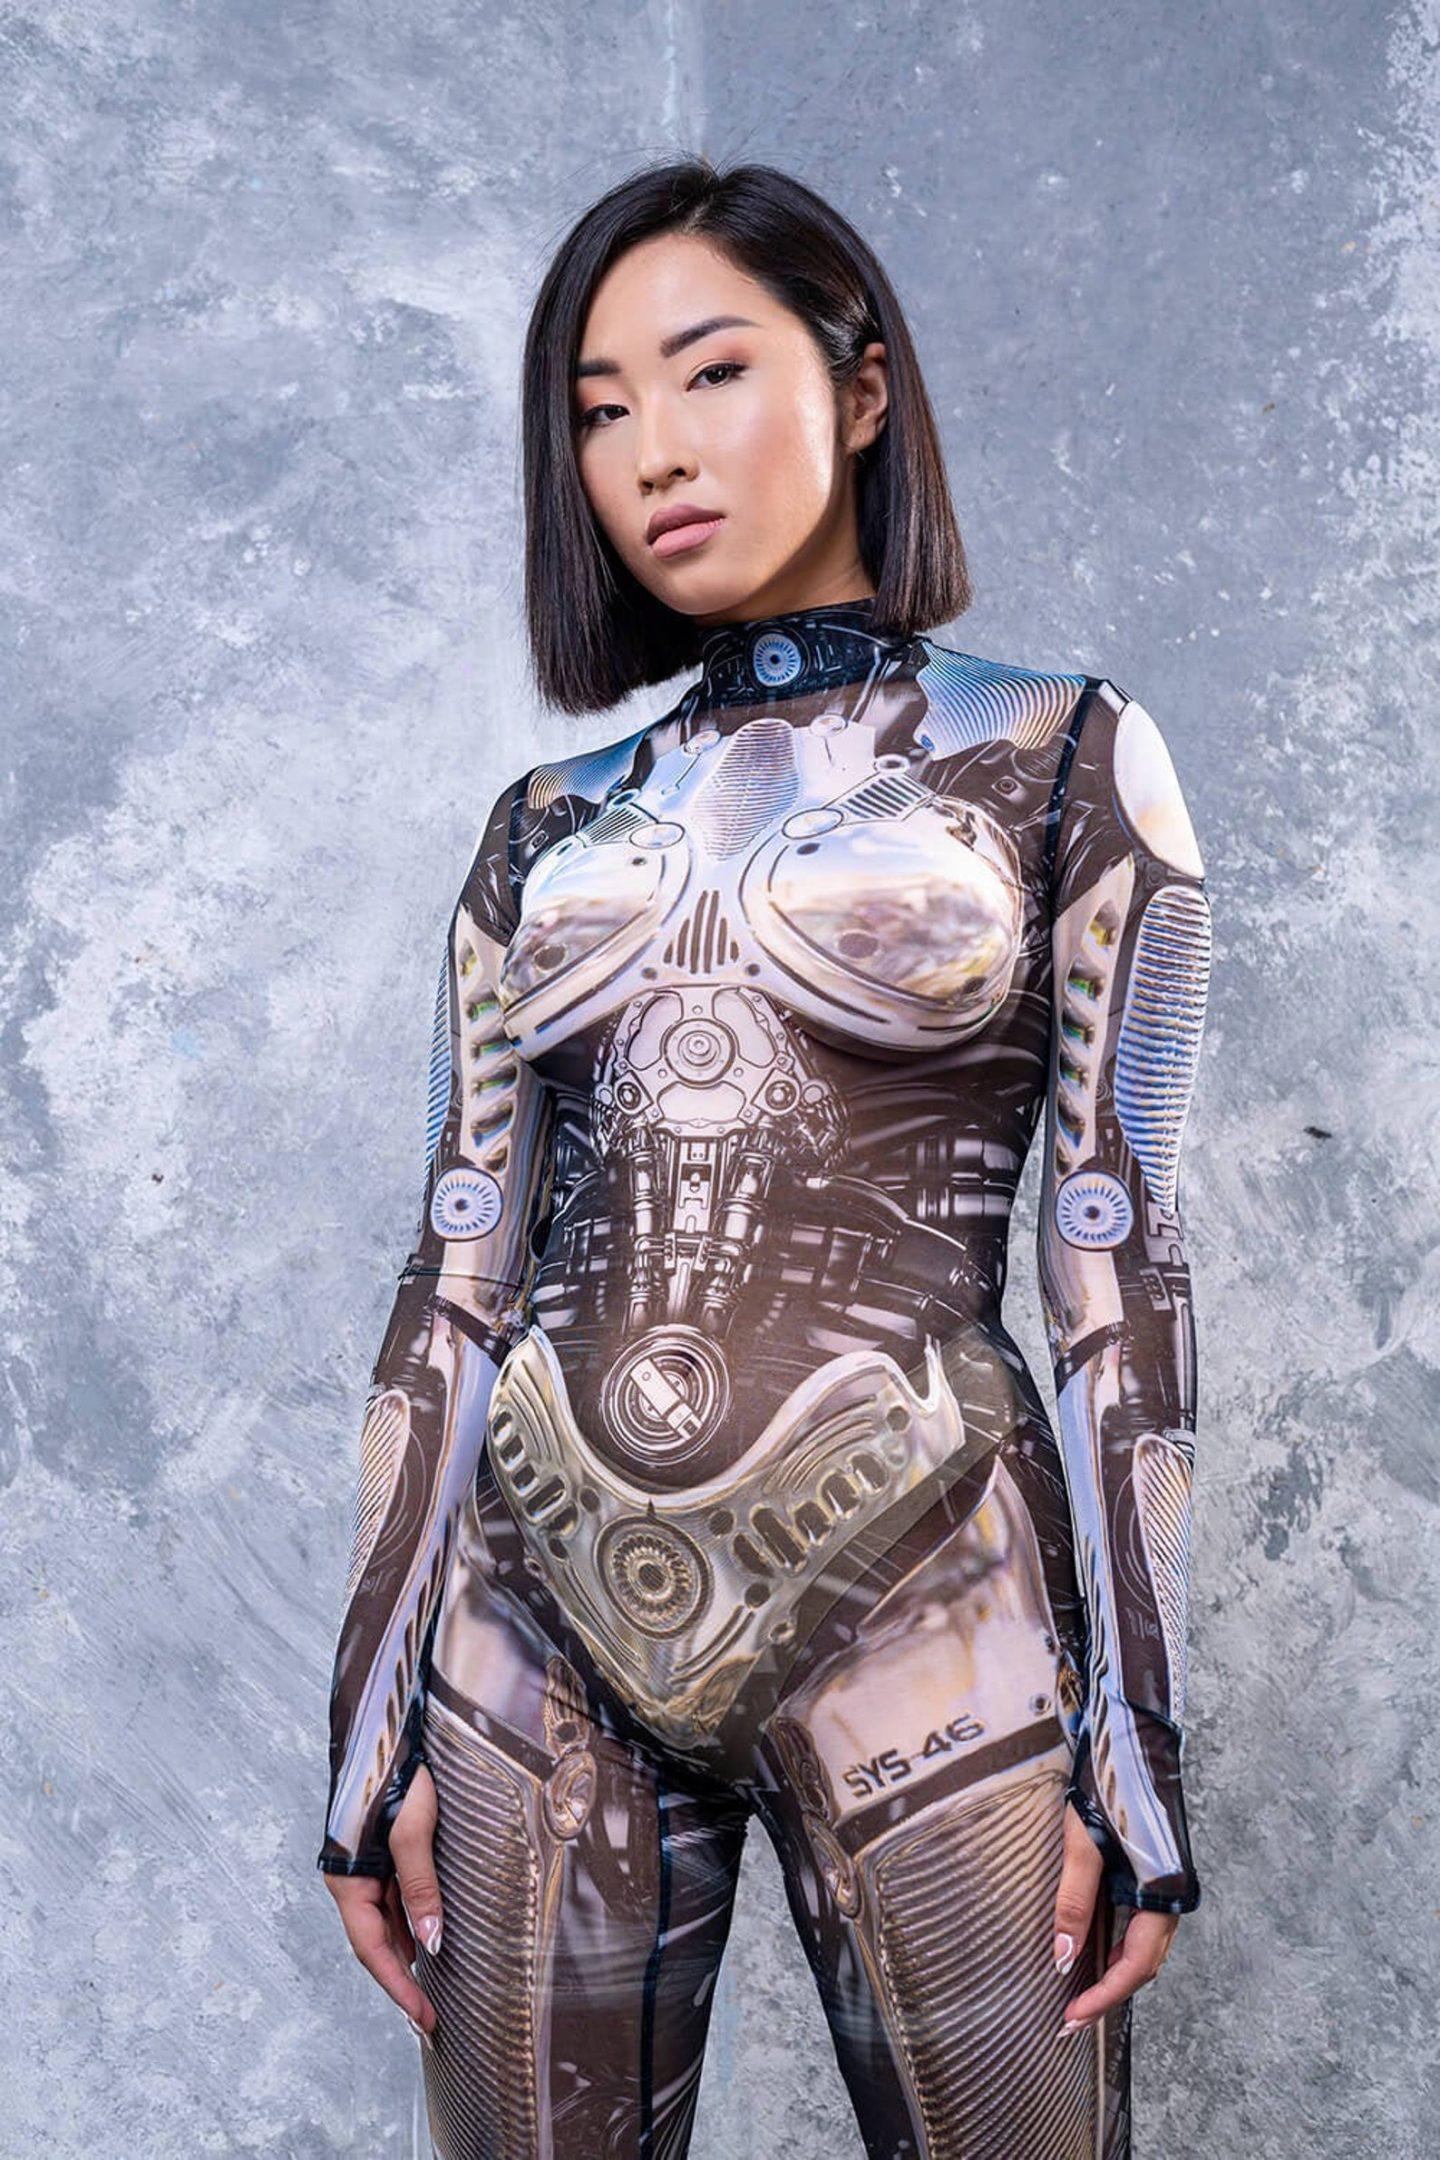 Hot sci-fi robot Halloween costume for women